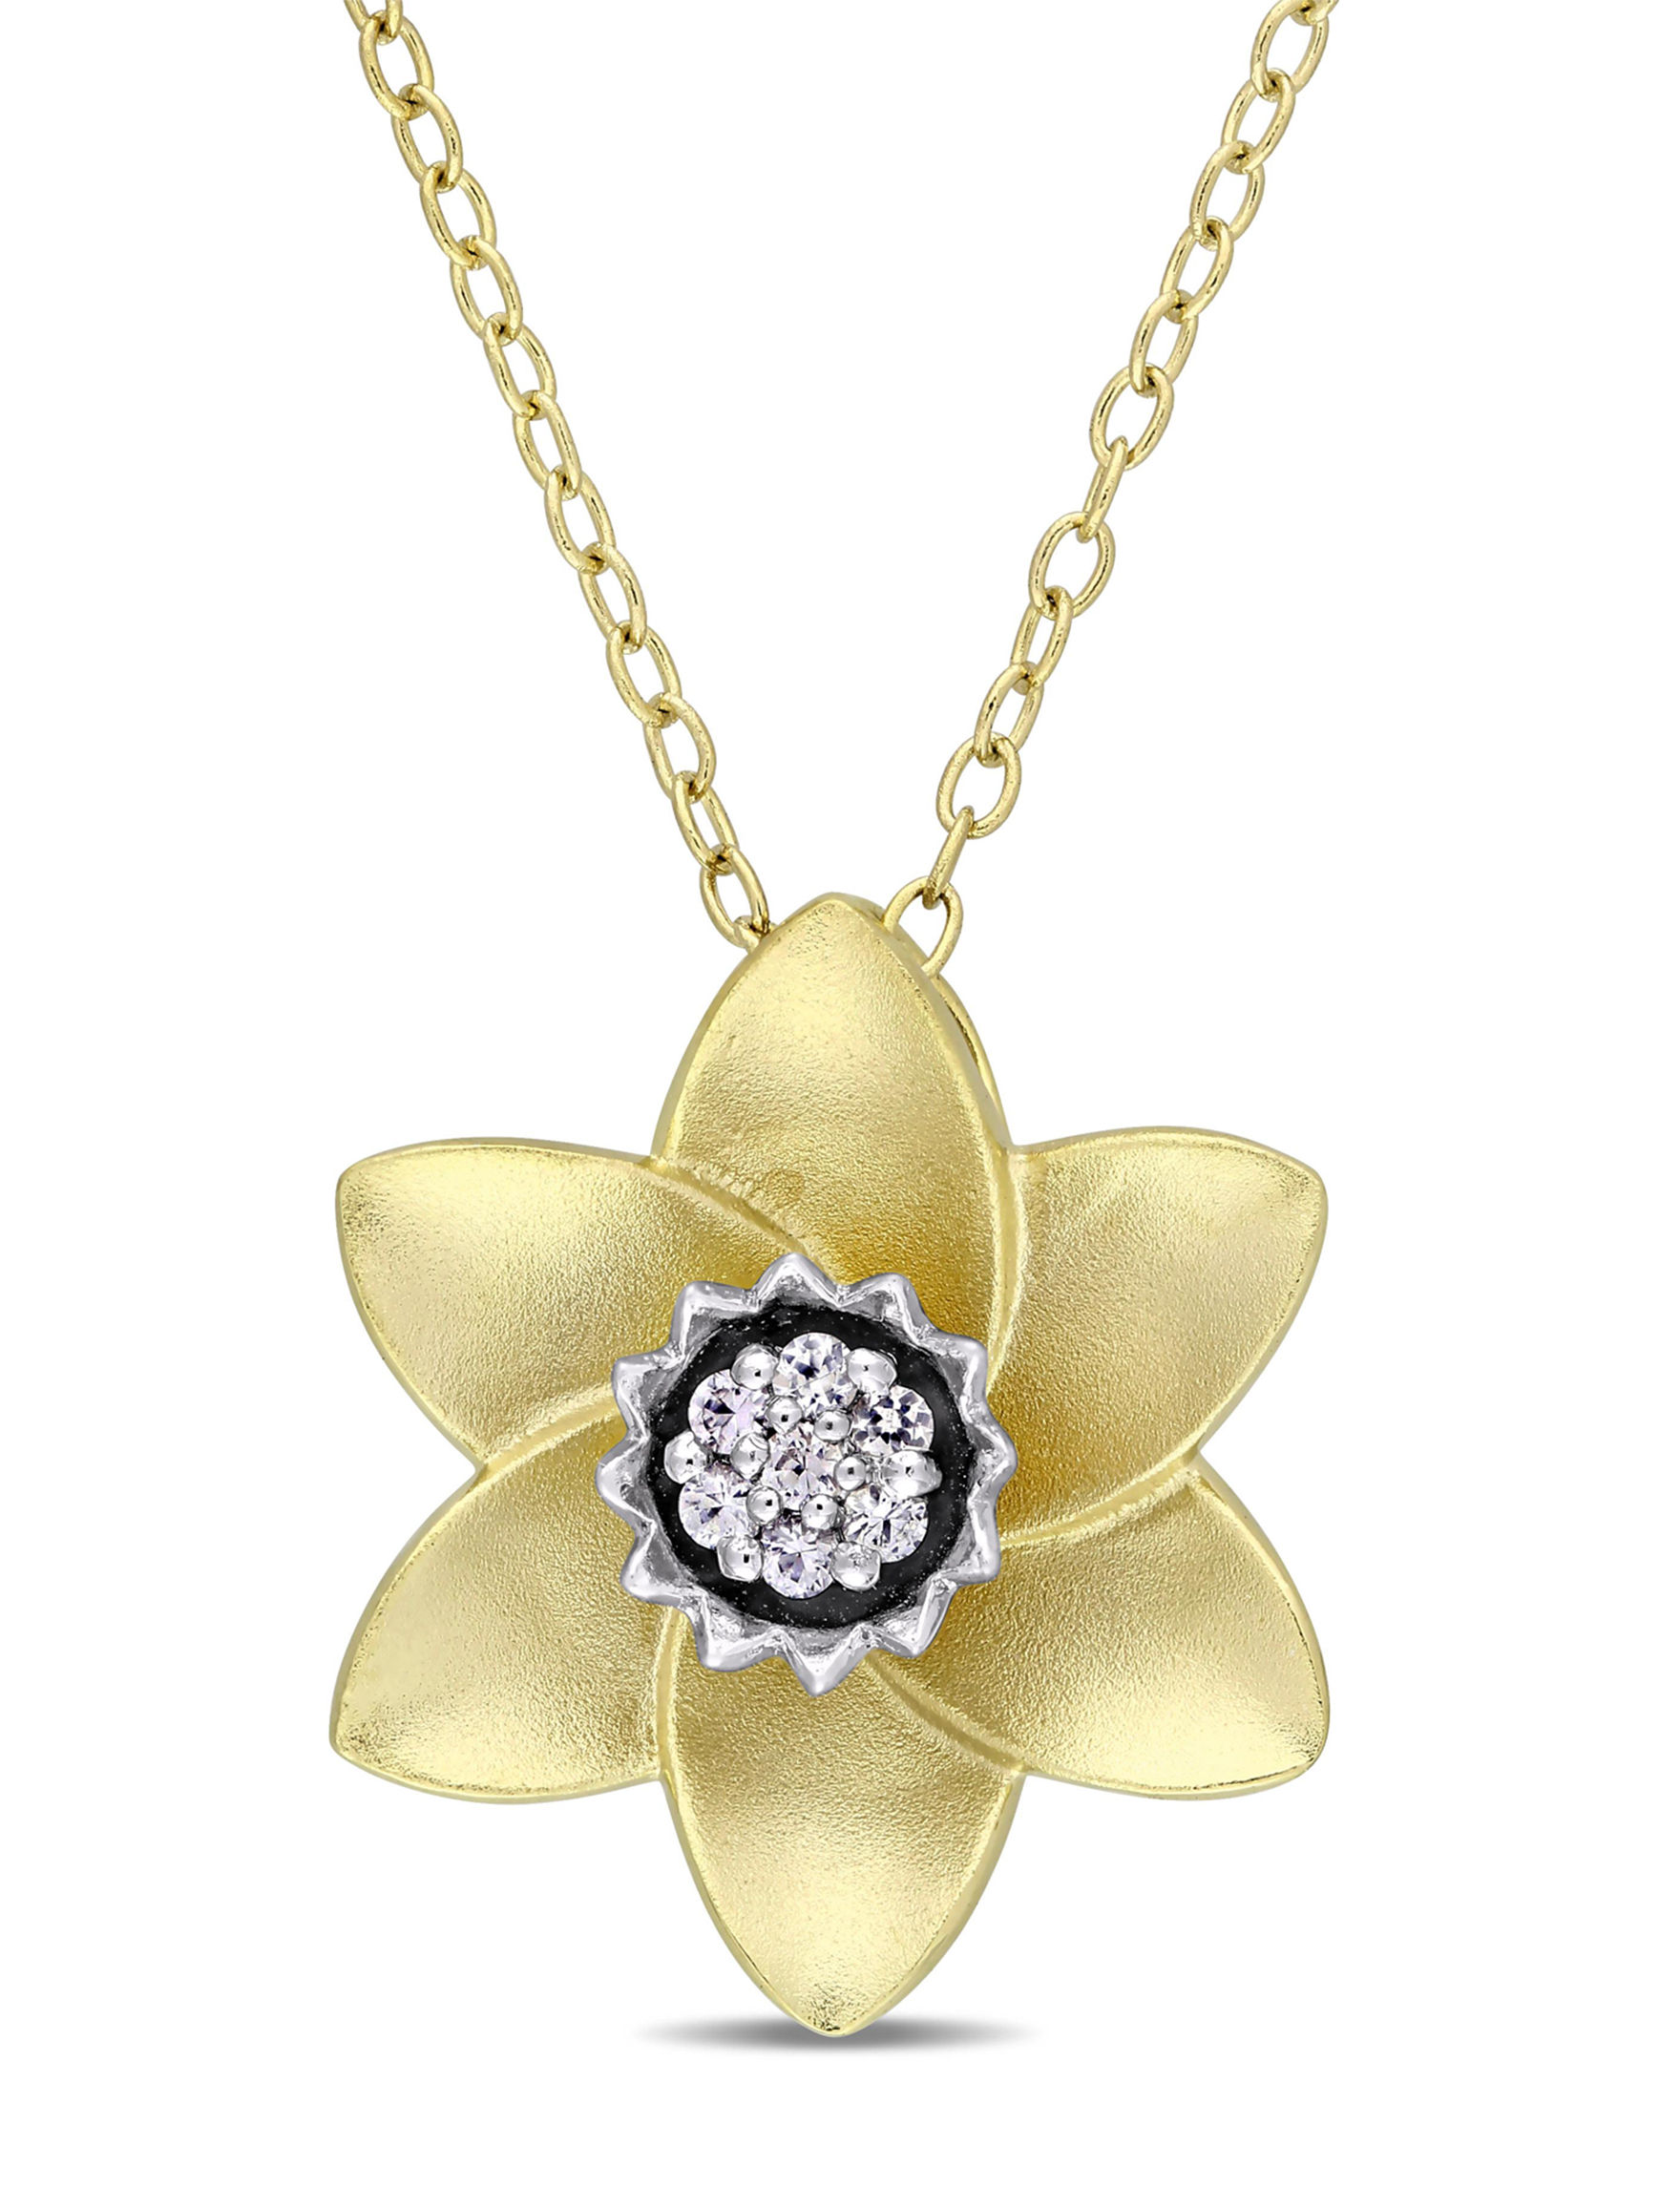 Laura Ashley Gold Necklaces & Pendants Fine Jewelry